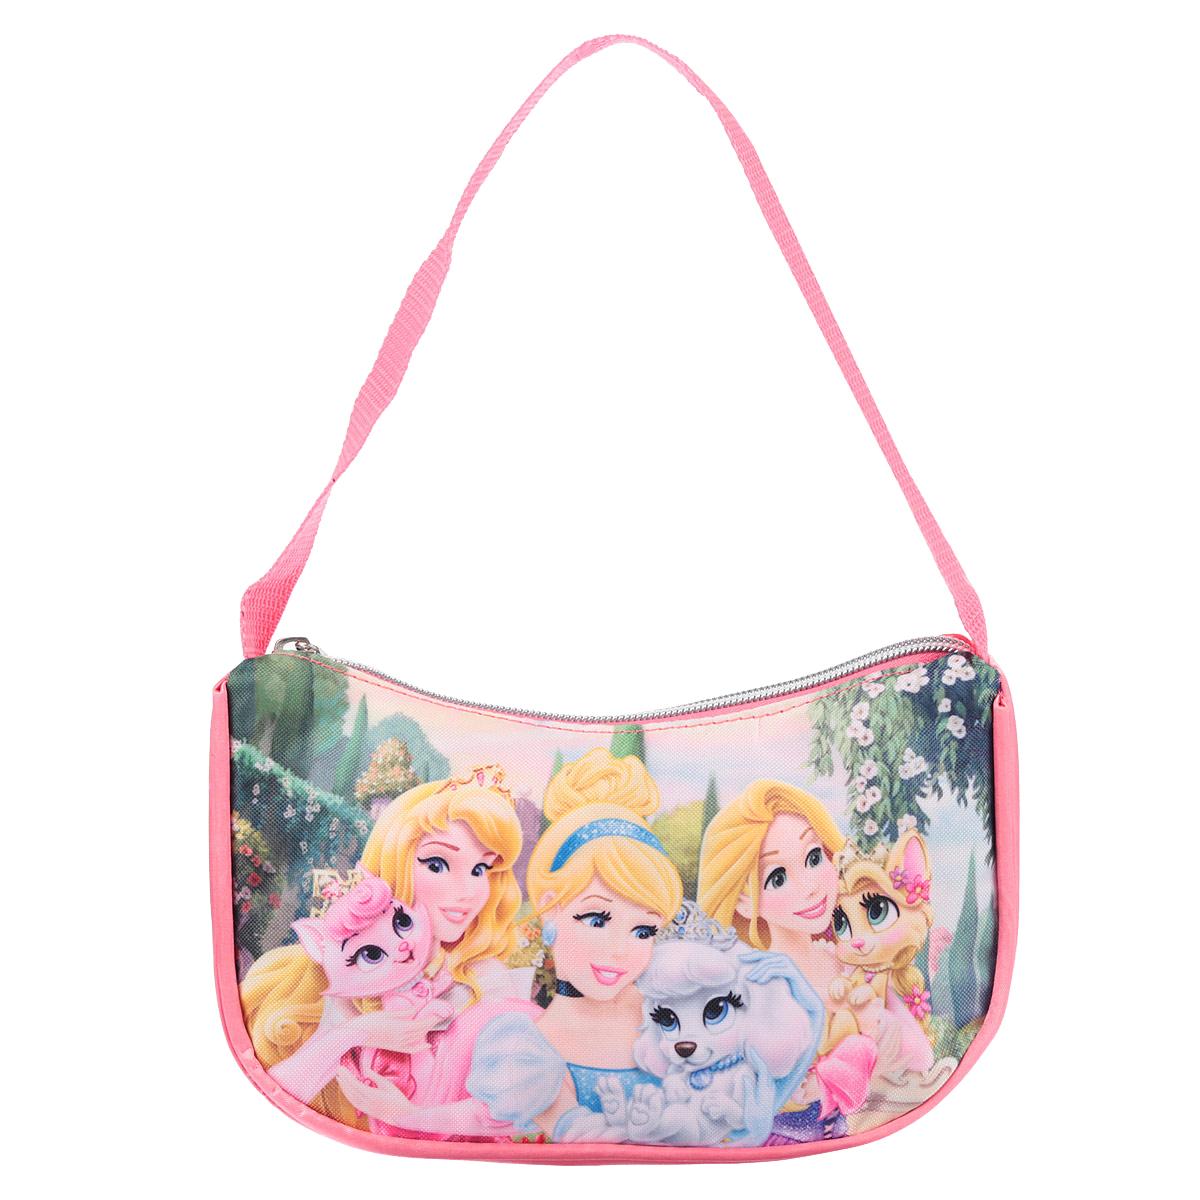 Сумочка детская Princess, цвет: розовый. PRCB-UT4-4018 сумочка princess цвет розовый prcb ut4 4017